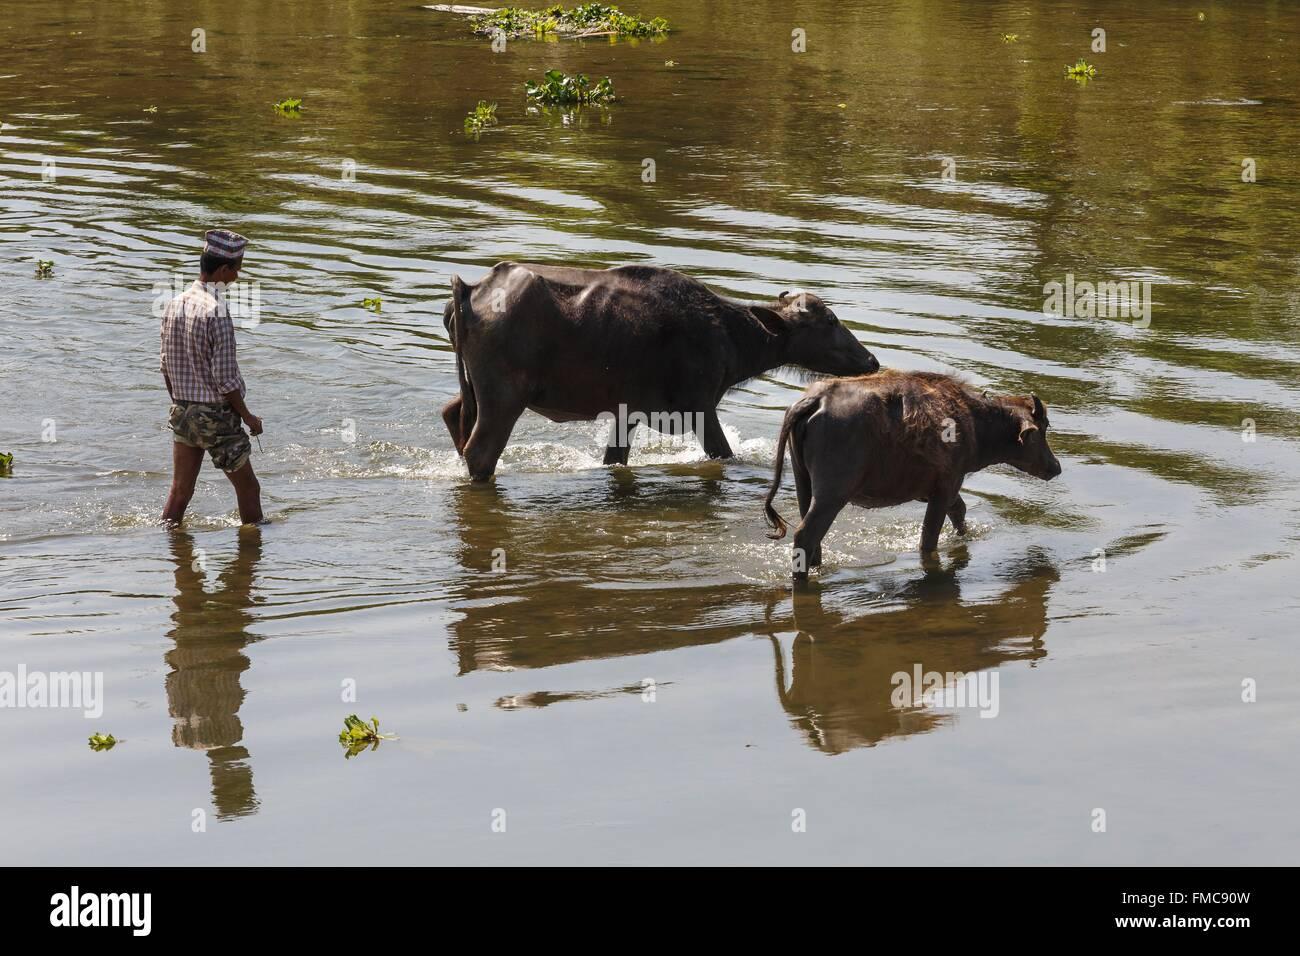 Nepal, Narayani zone, Sauraha, two buffalos and a man in the Budhi Rapti river - Stock Image